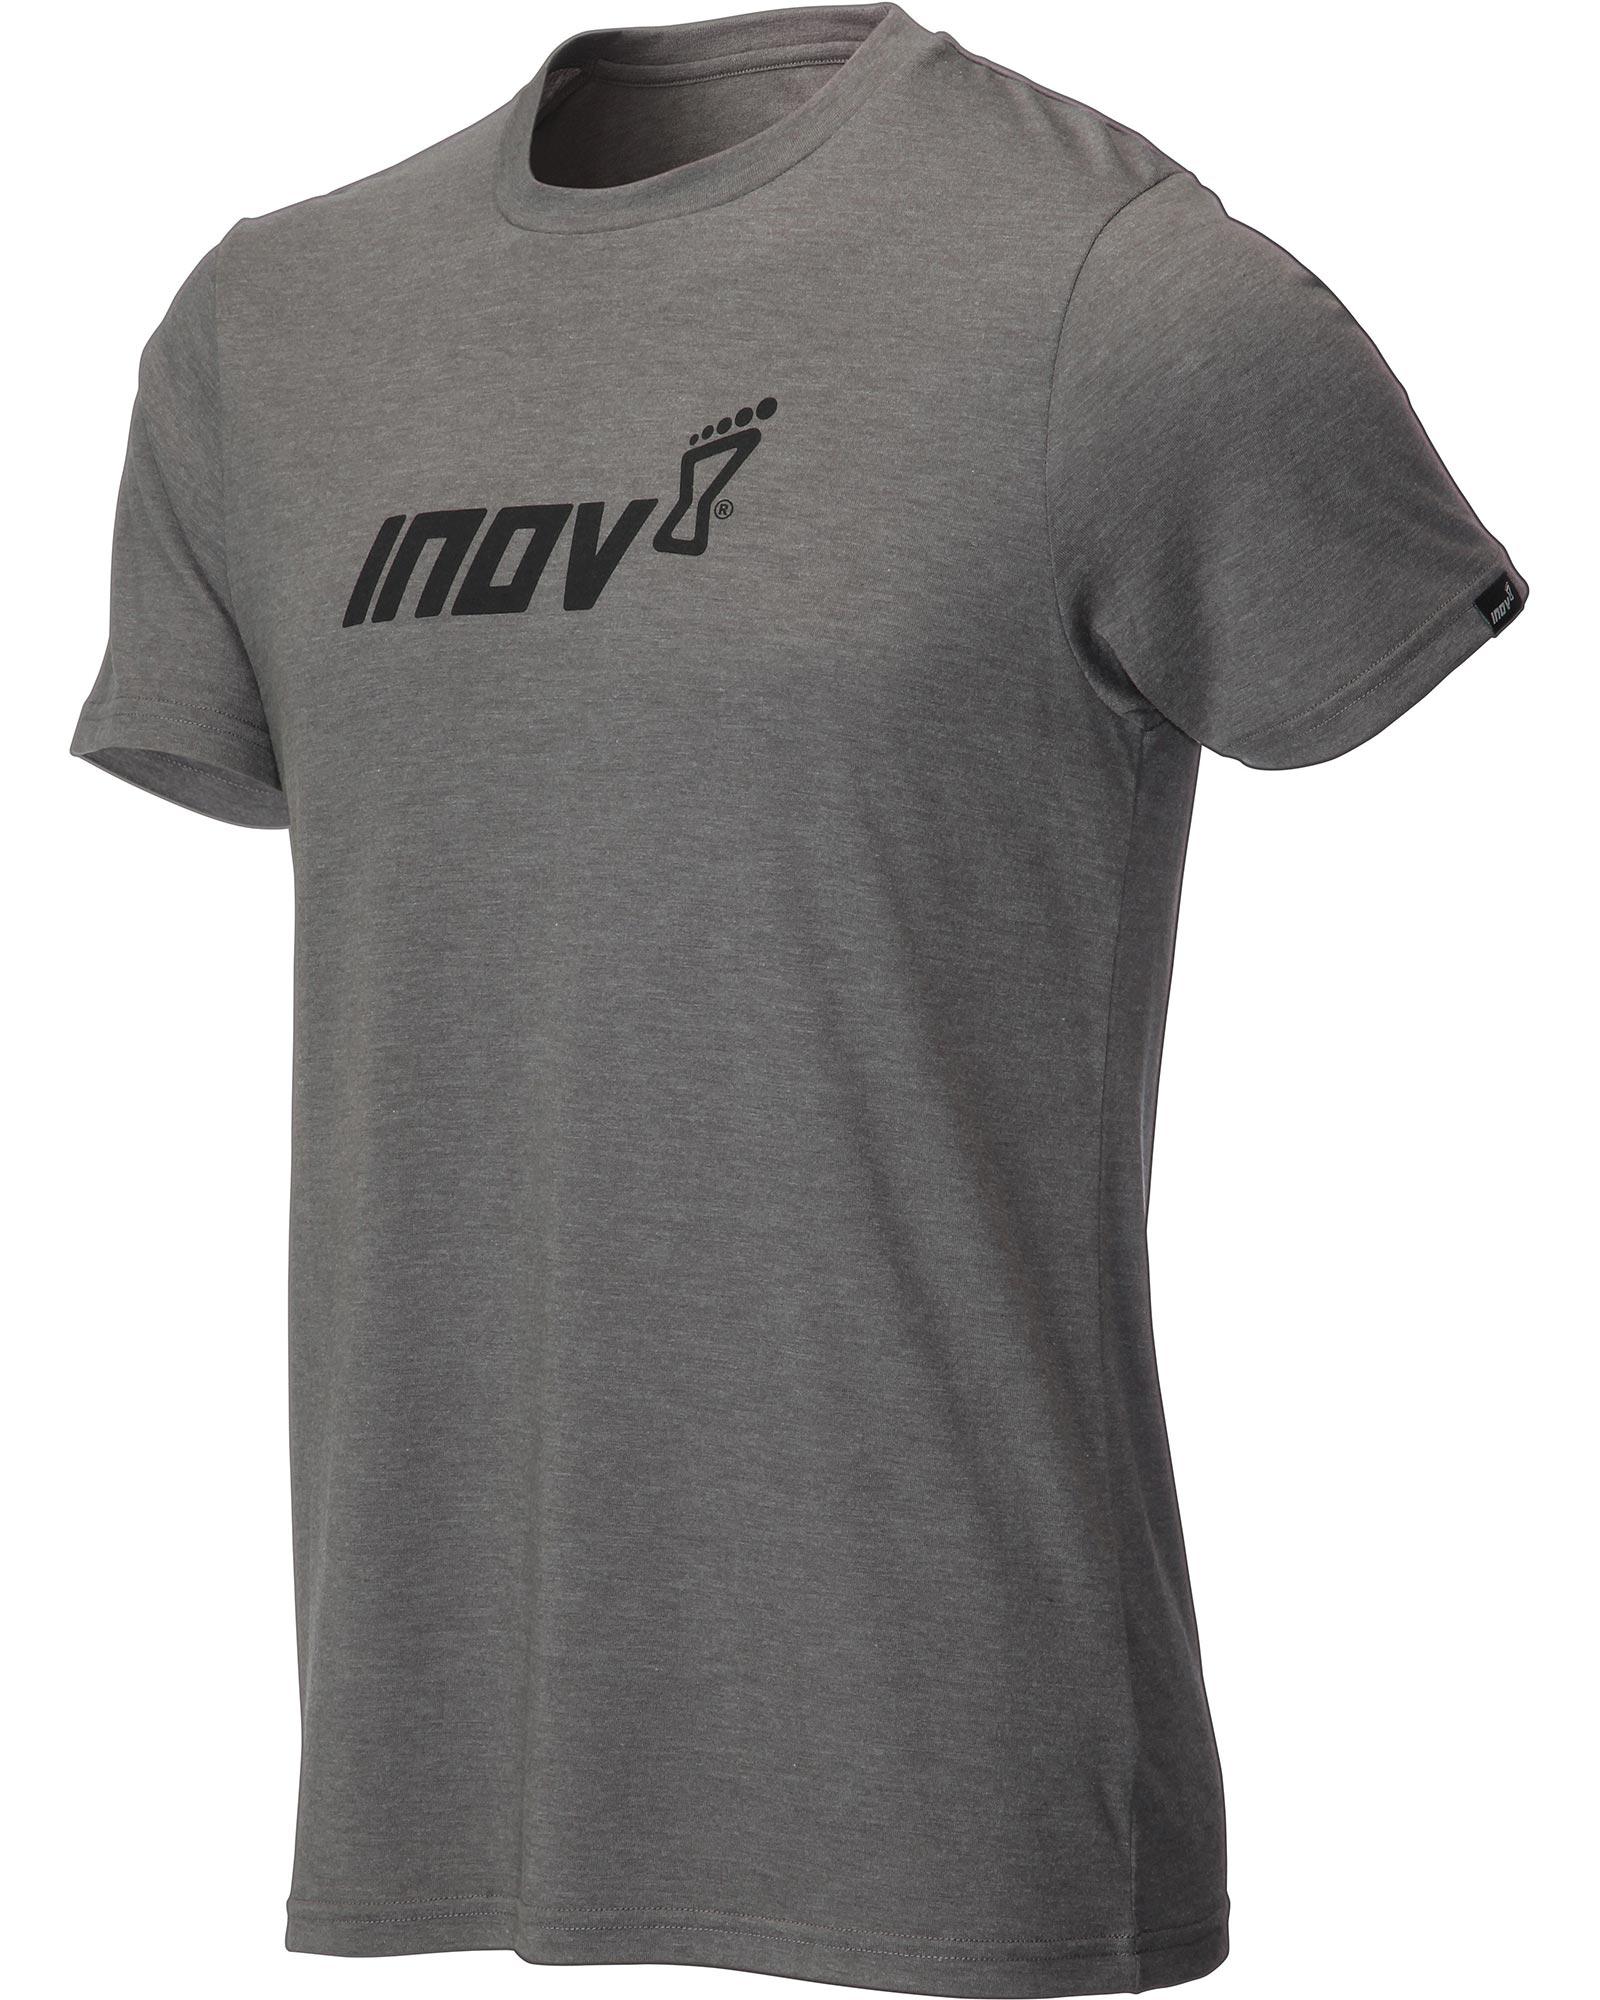 Inov-8 Men's S/S Triblend T-Shirt 0